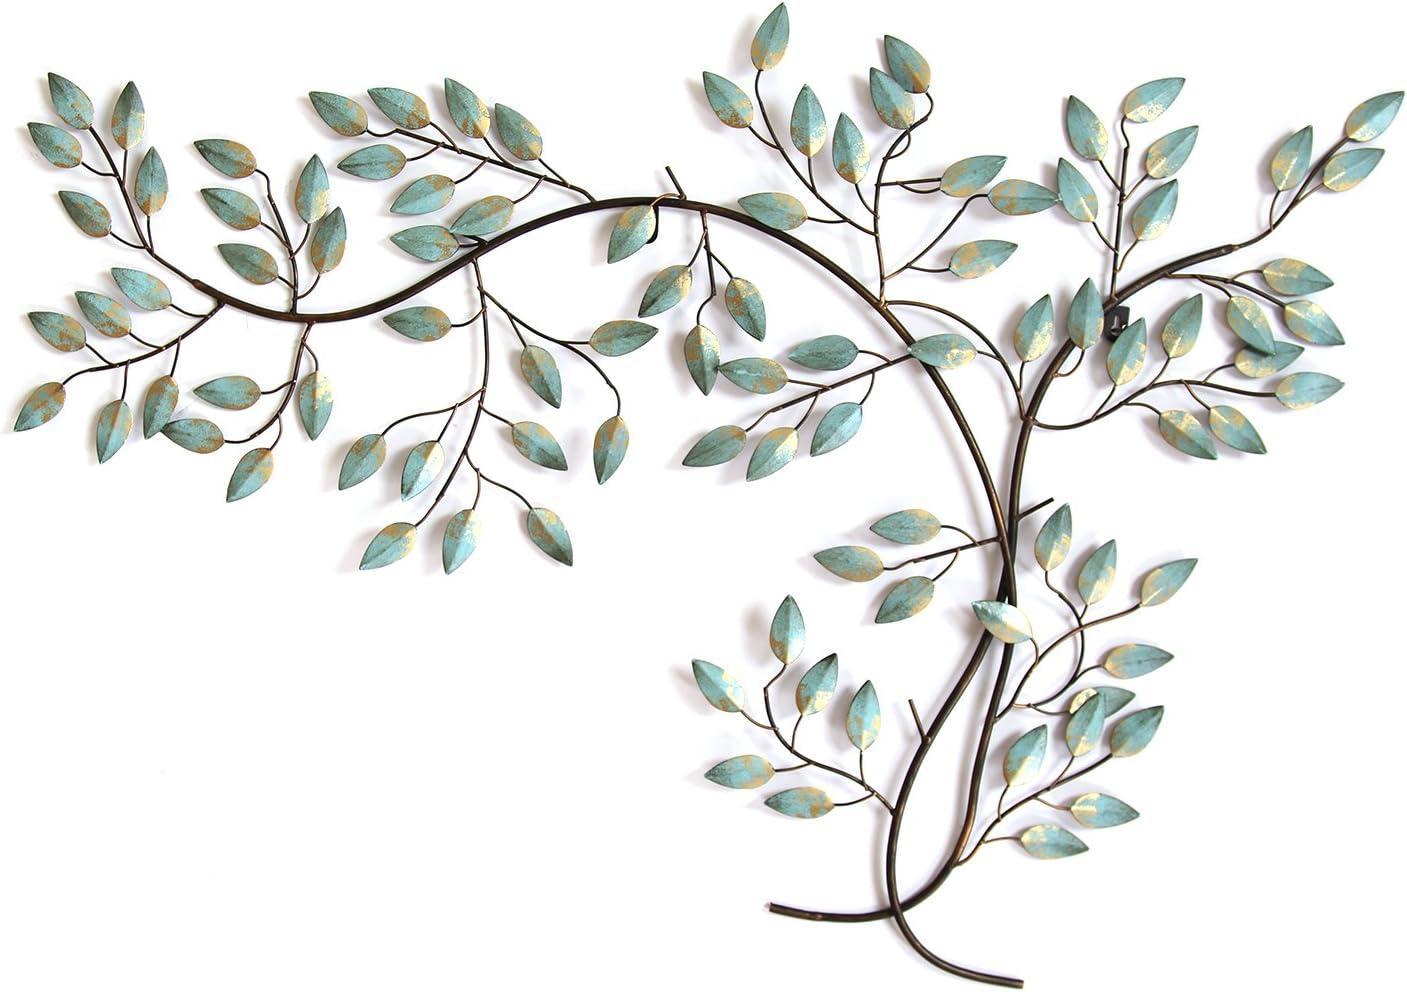 Stratton Home Decor Patina Tree Branch Wall Decor, 39.00 W X 0.51 D x 27.56 H